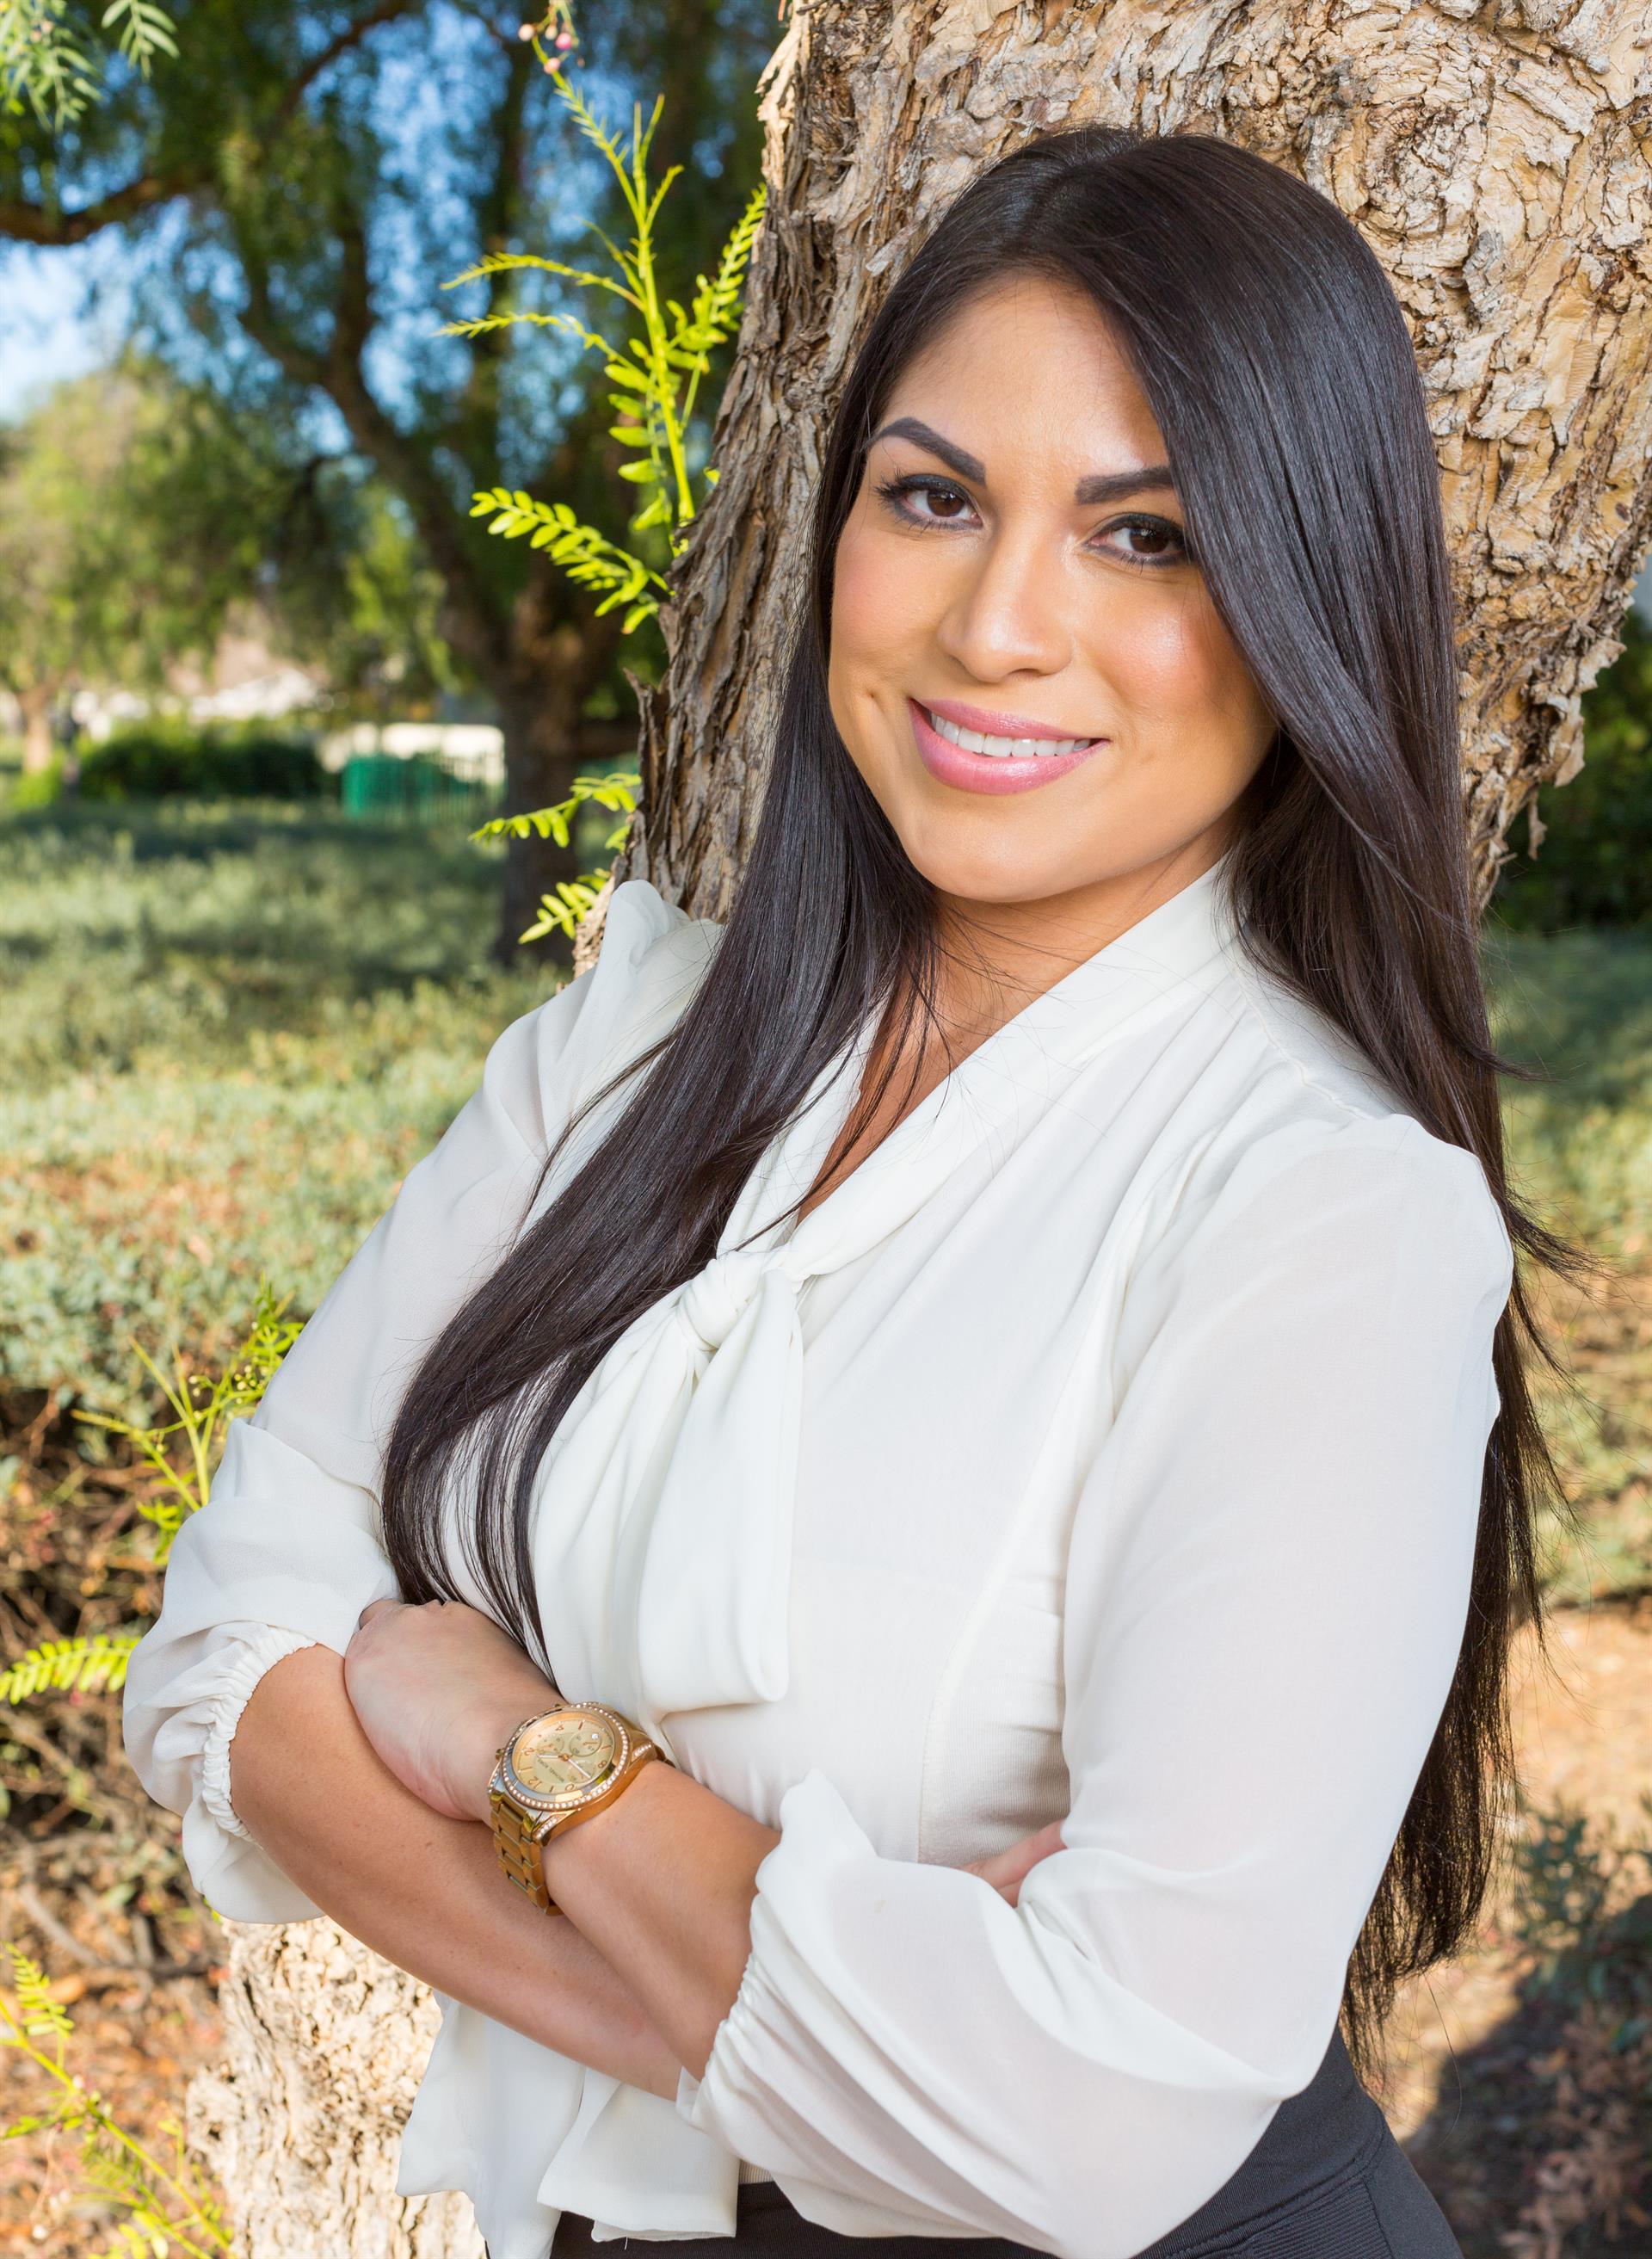 Angie Soto